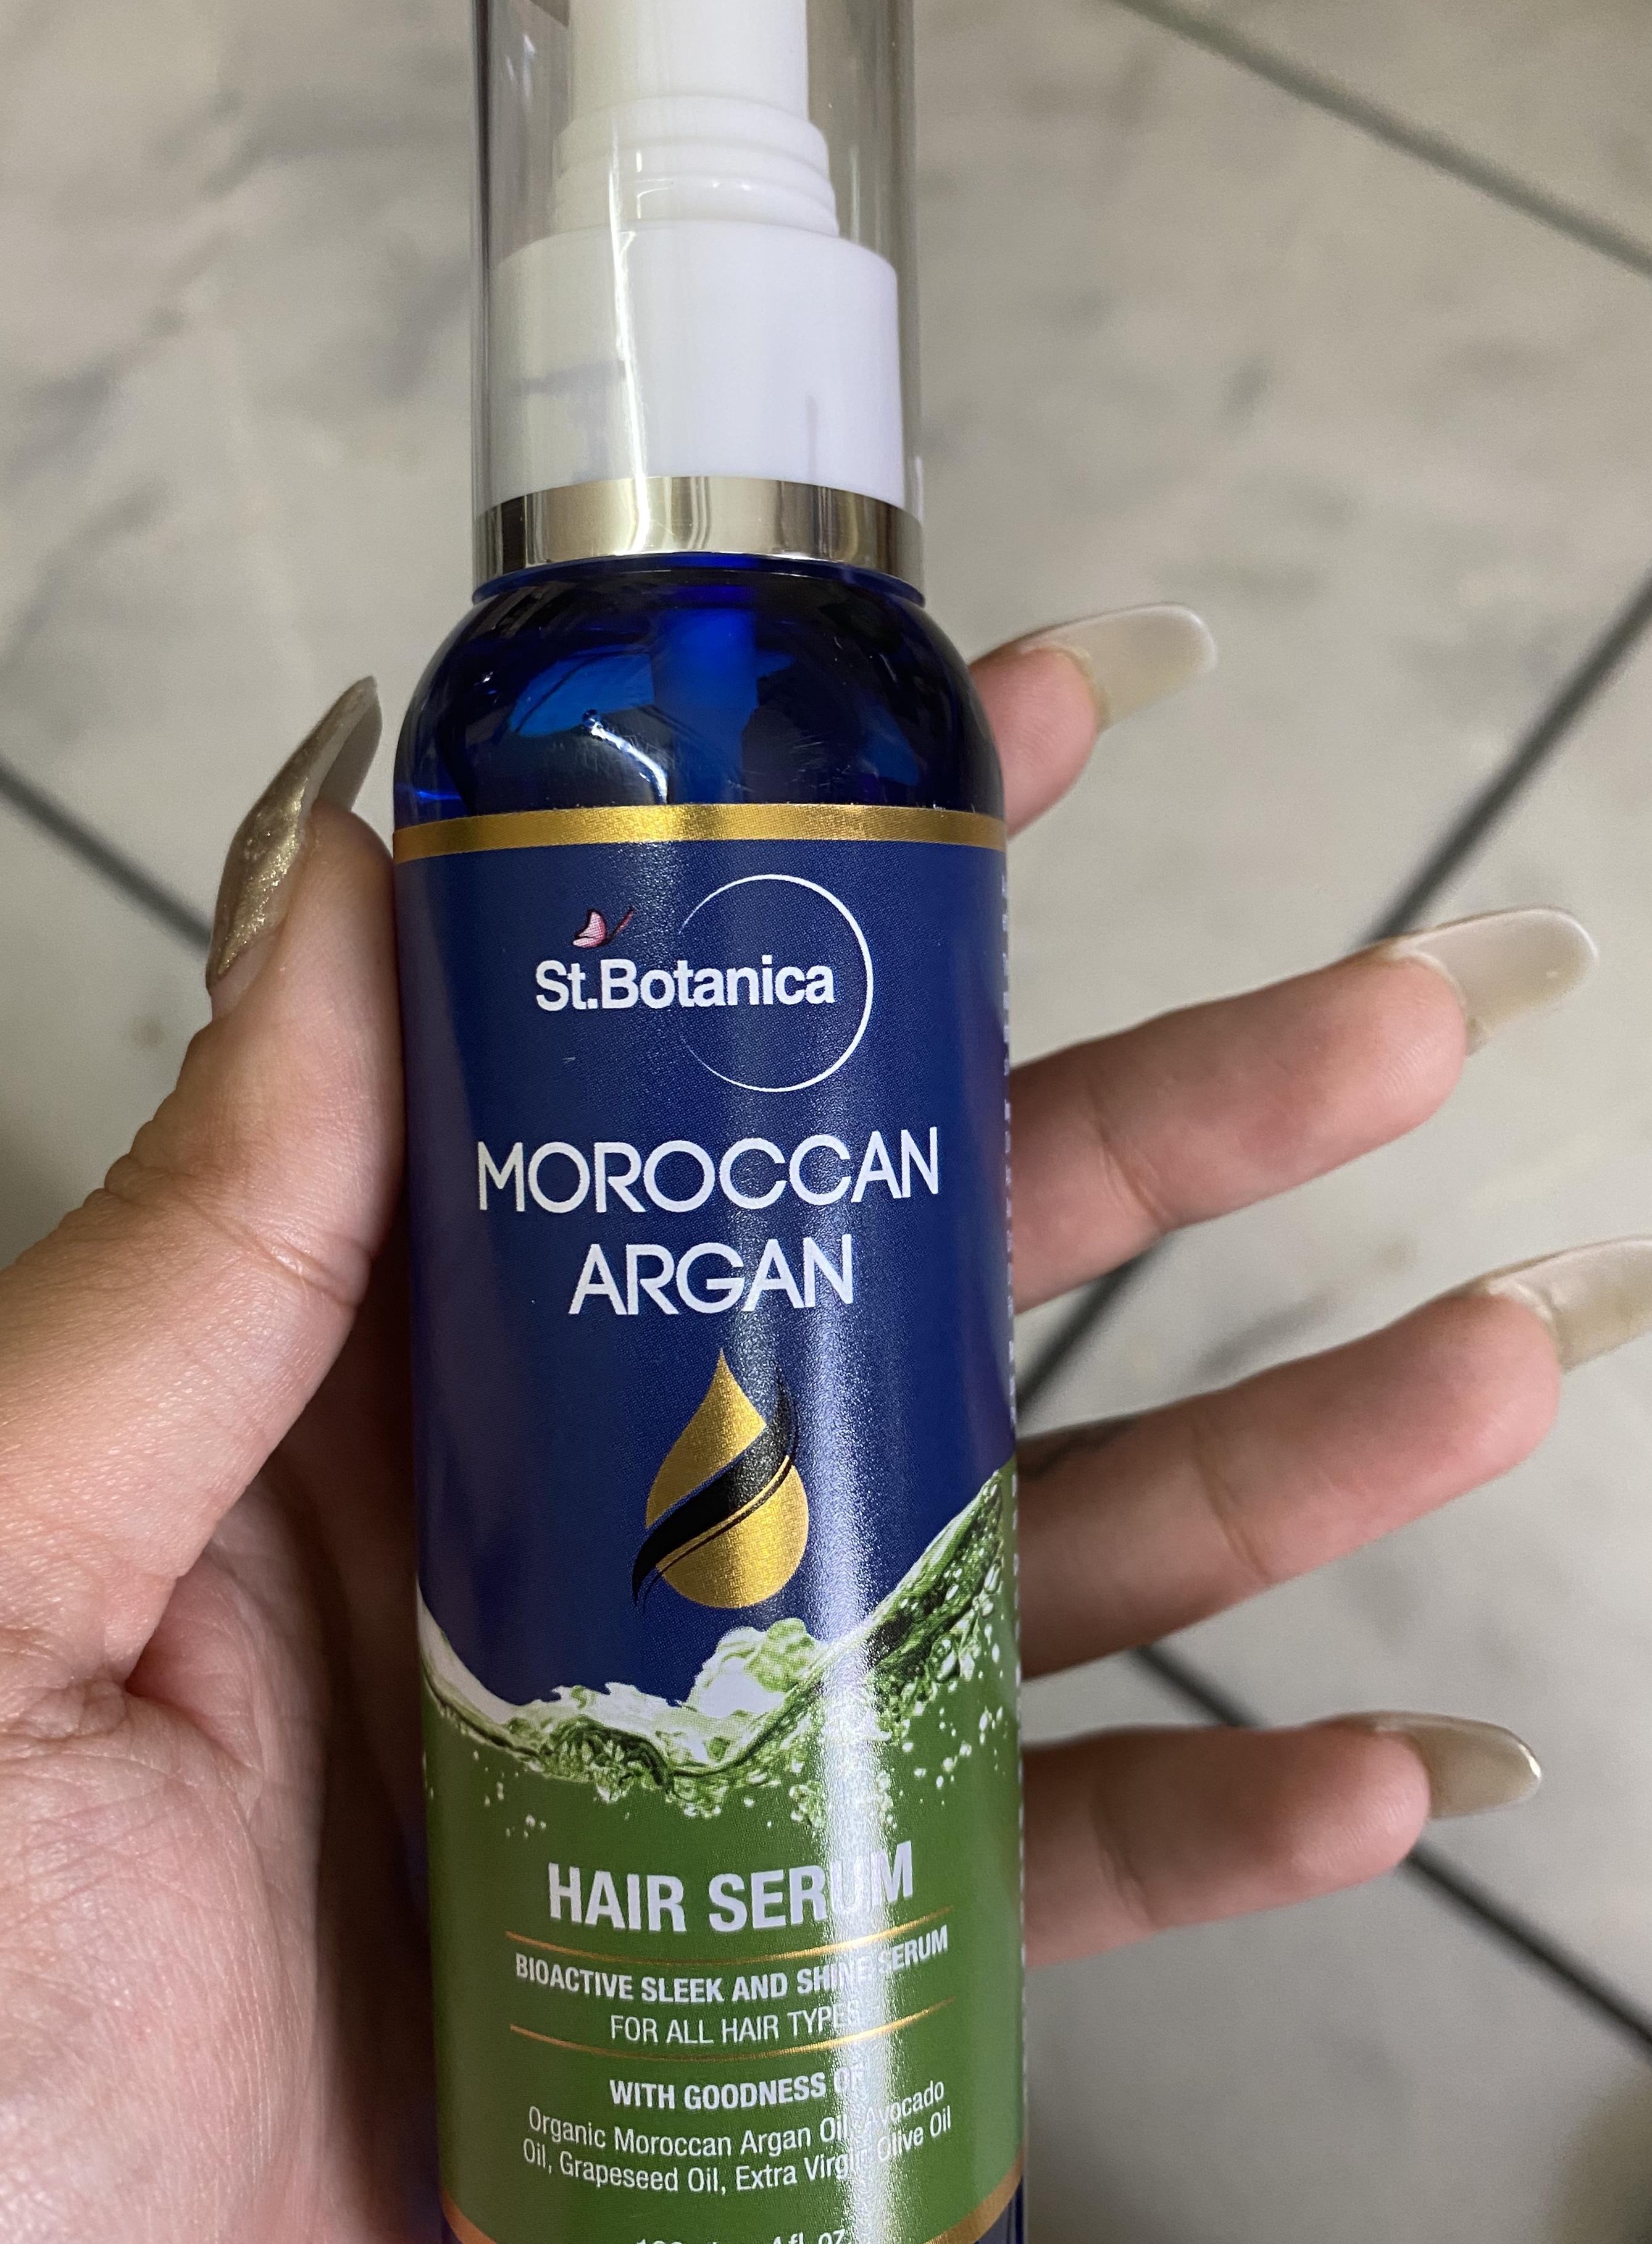 St.Botanica Moroccan Argan Hair Serum -Smooth and manageable hair-By ritika_malik